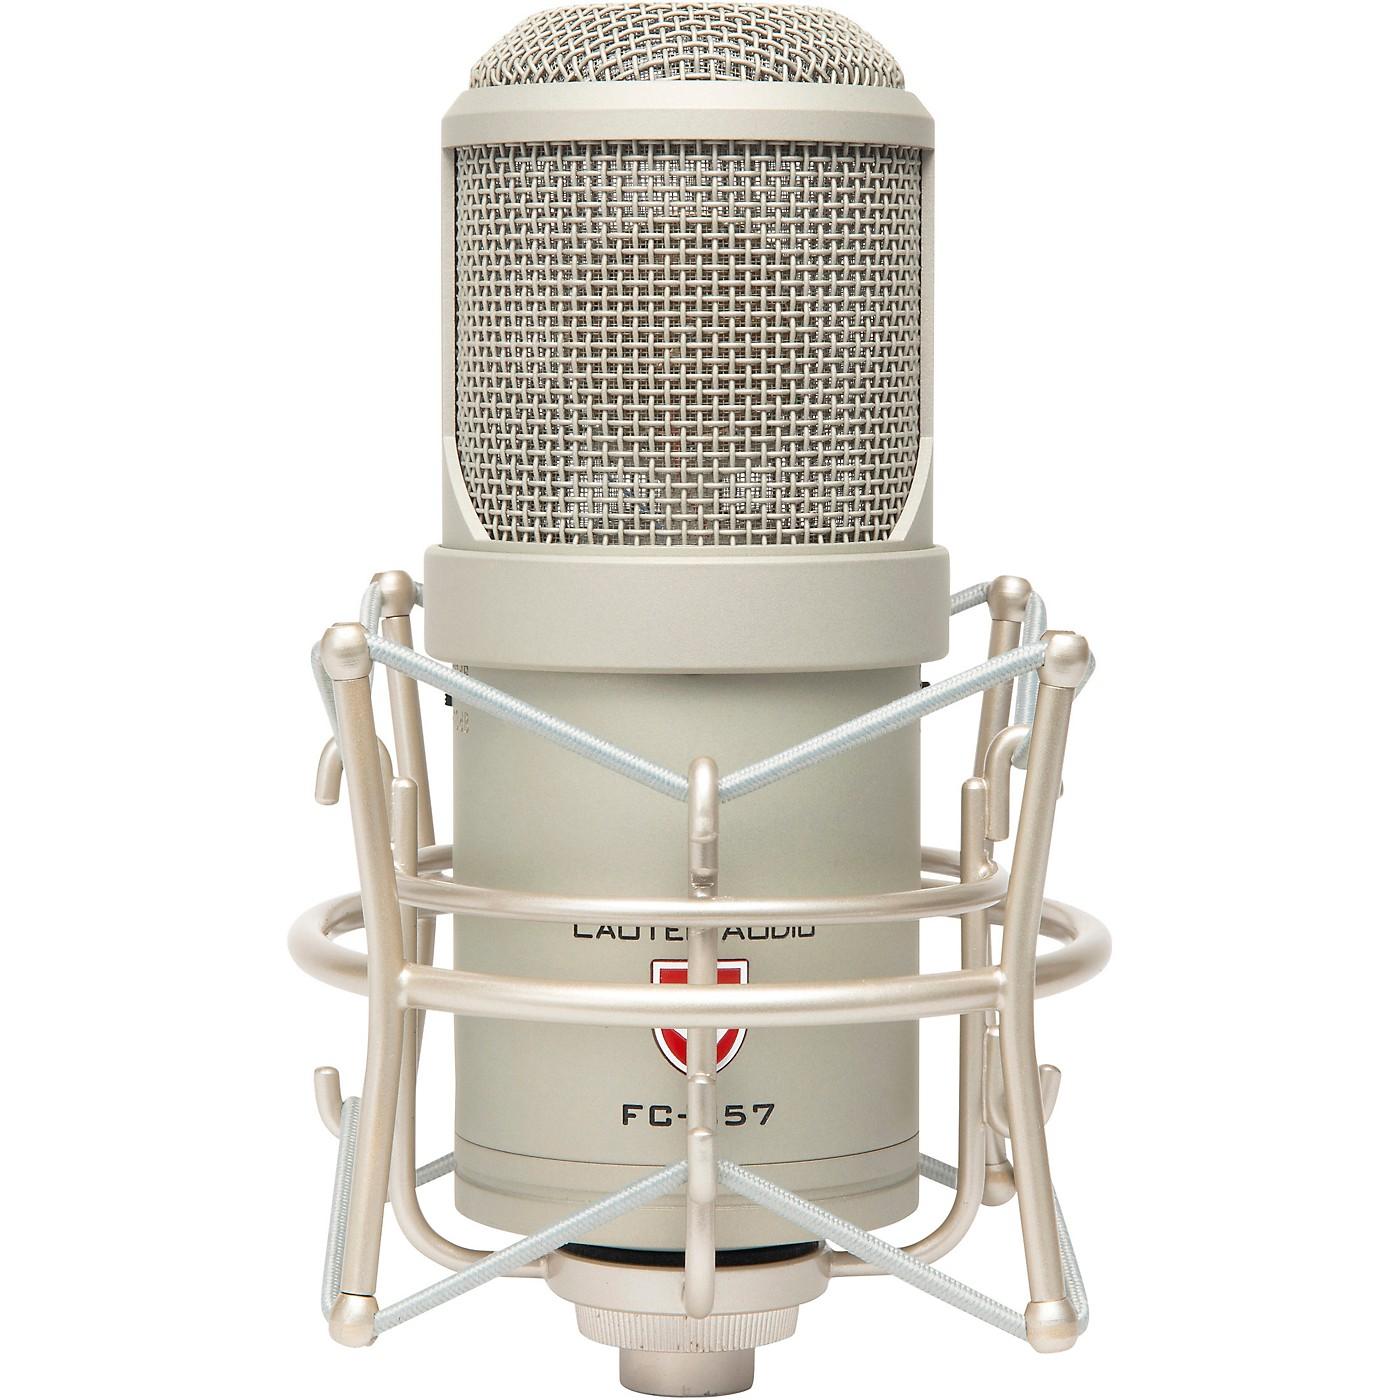 Lauten Audio Clarion FC-357 FET Condenser Microphone thumbnail